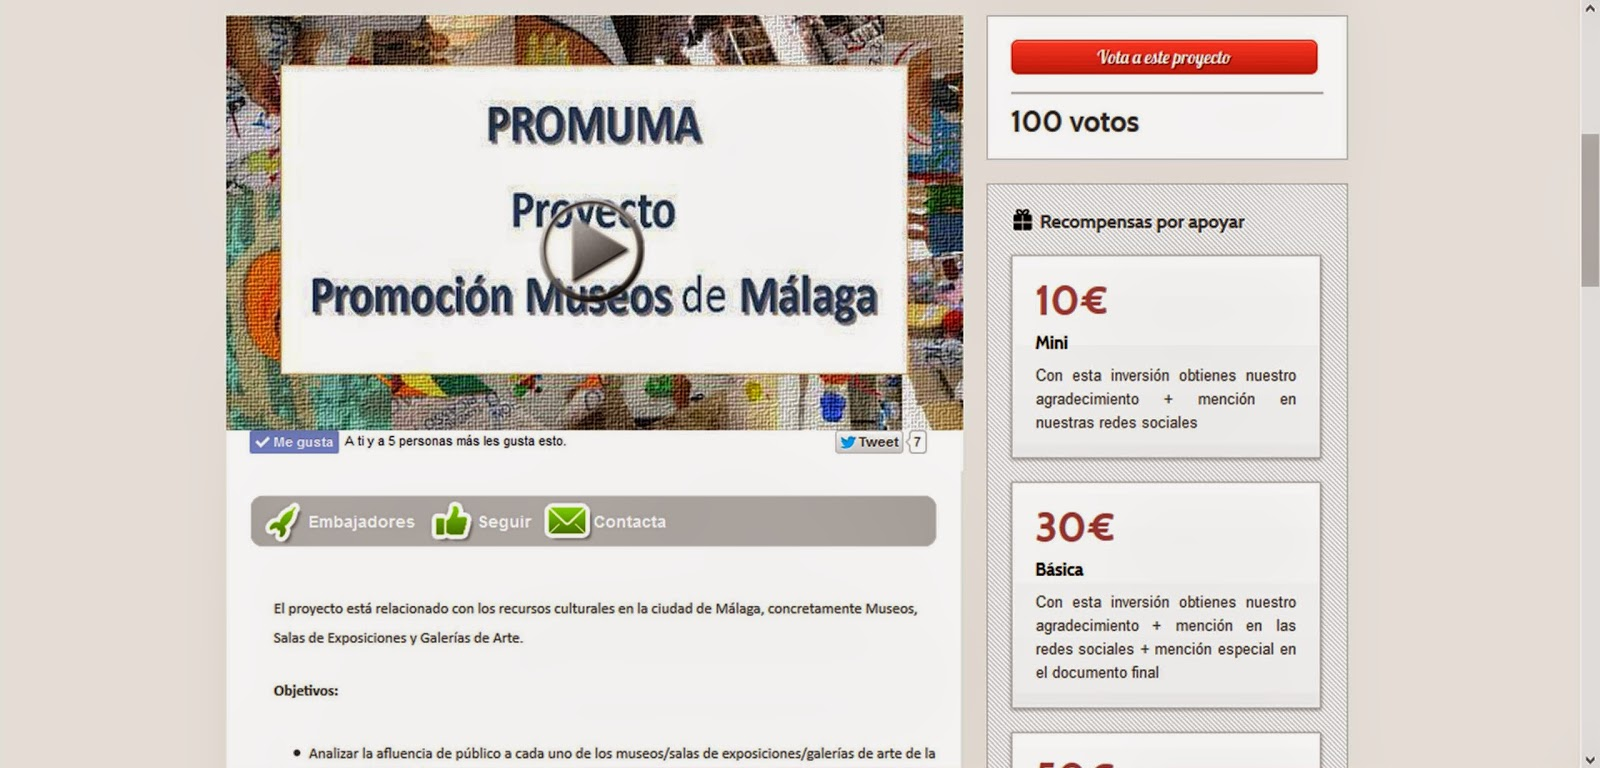 http://www.lanzanos.com/proyectos/promuma-proyecto-promocion-museos-malaga/